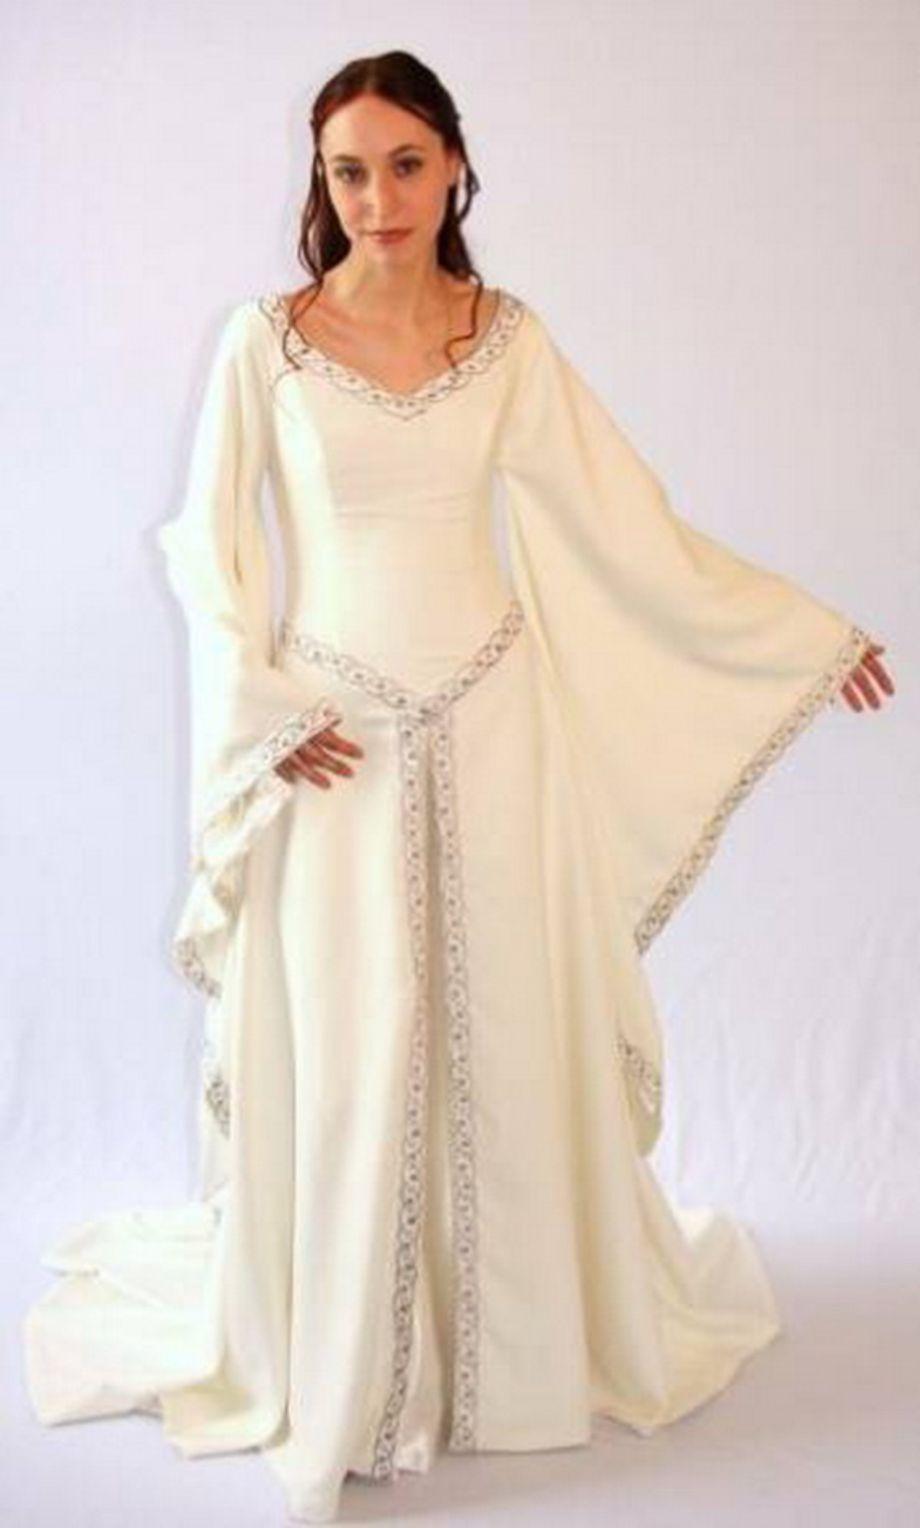 Modern Celtic Wedding Dress